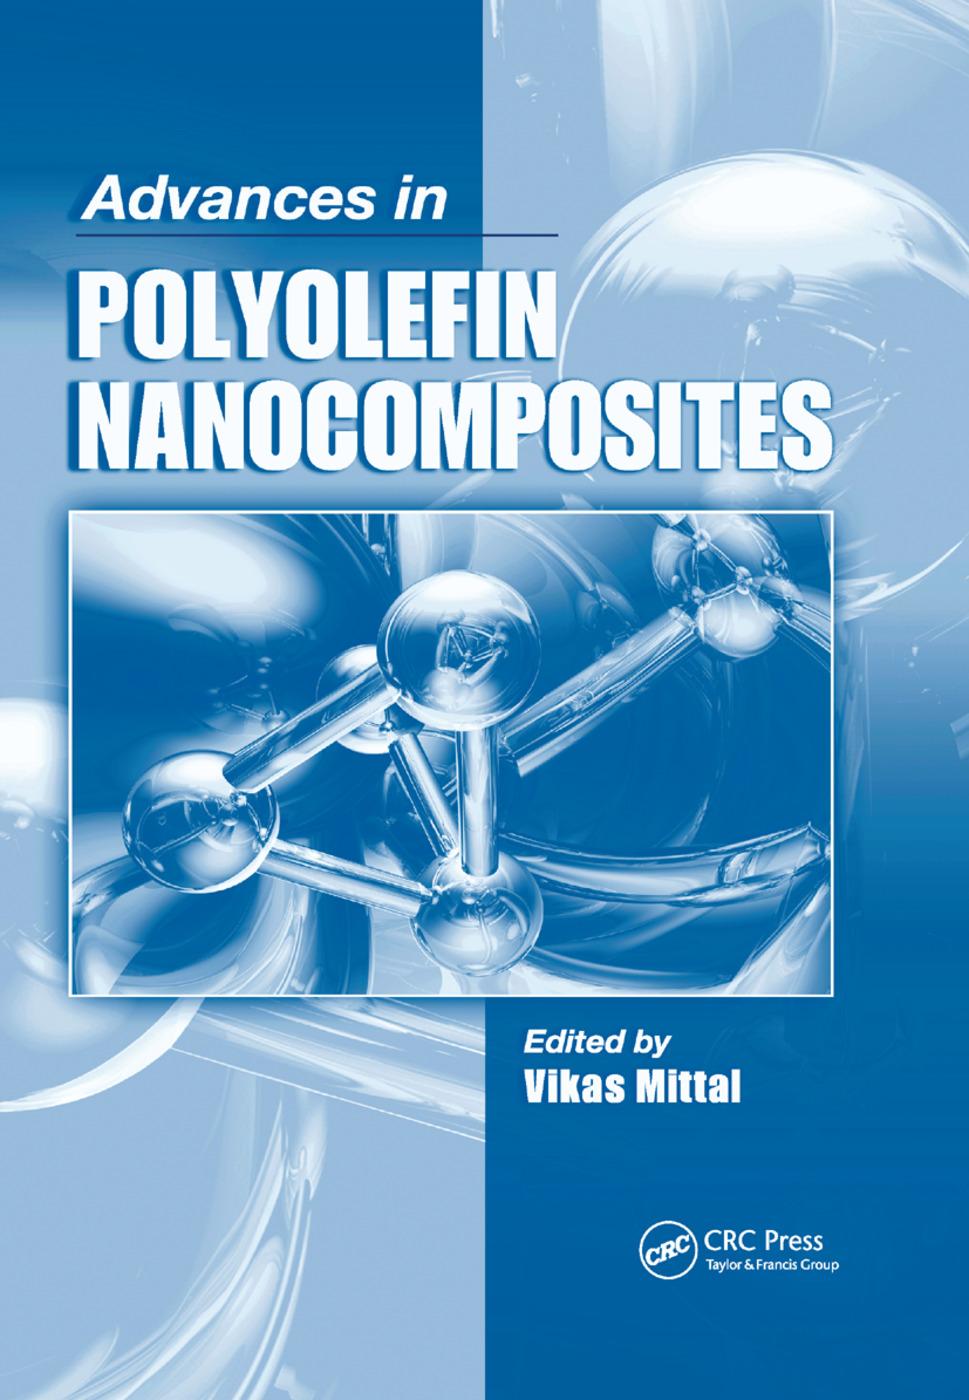 Advances in Polyolefin Nanocomposites: 1st Edition (Paperback) book cover